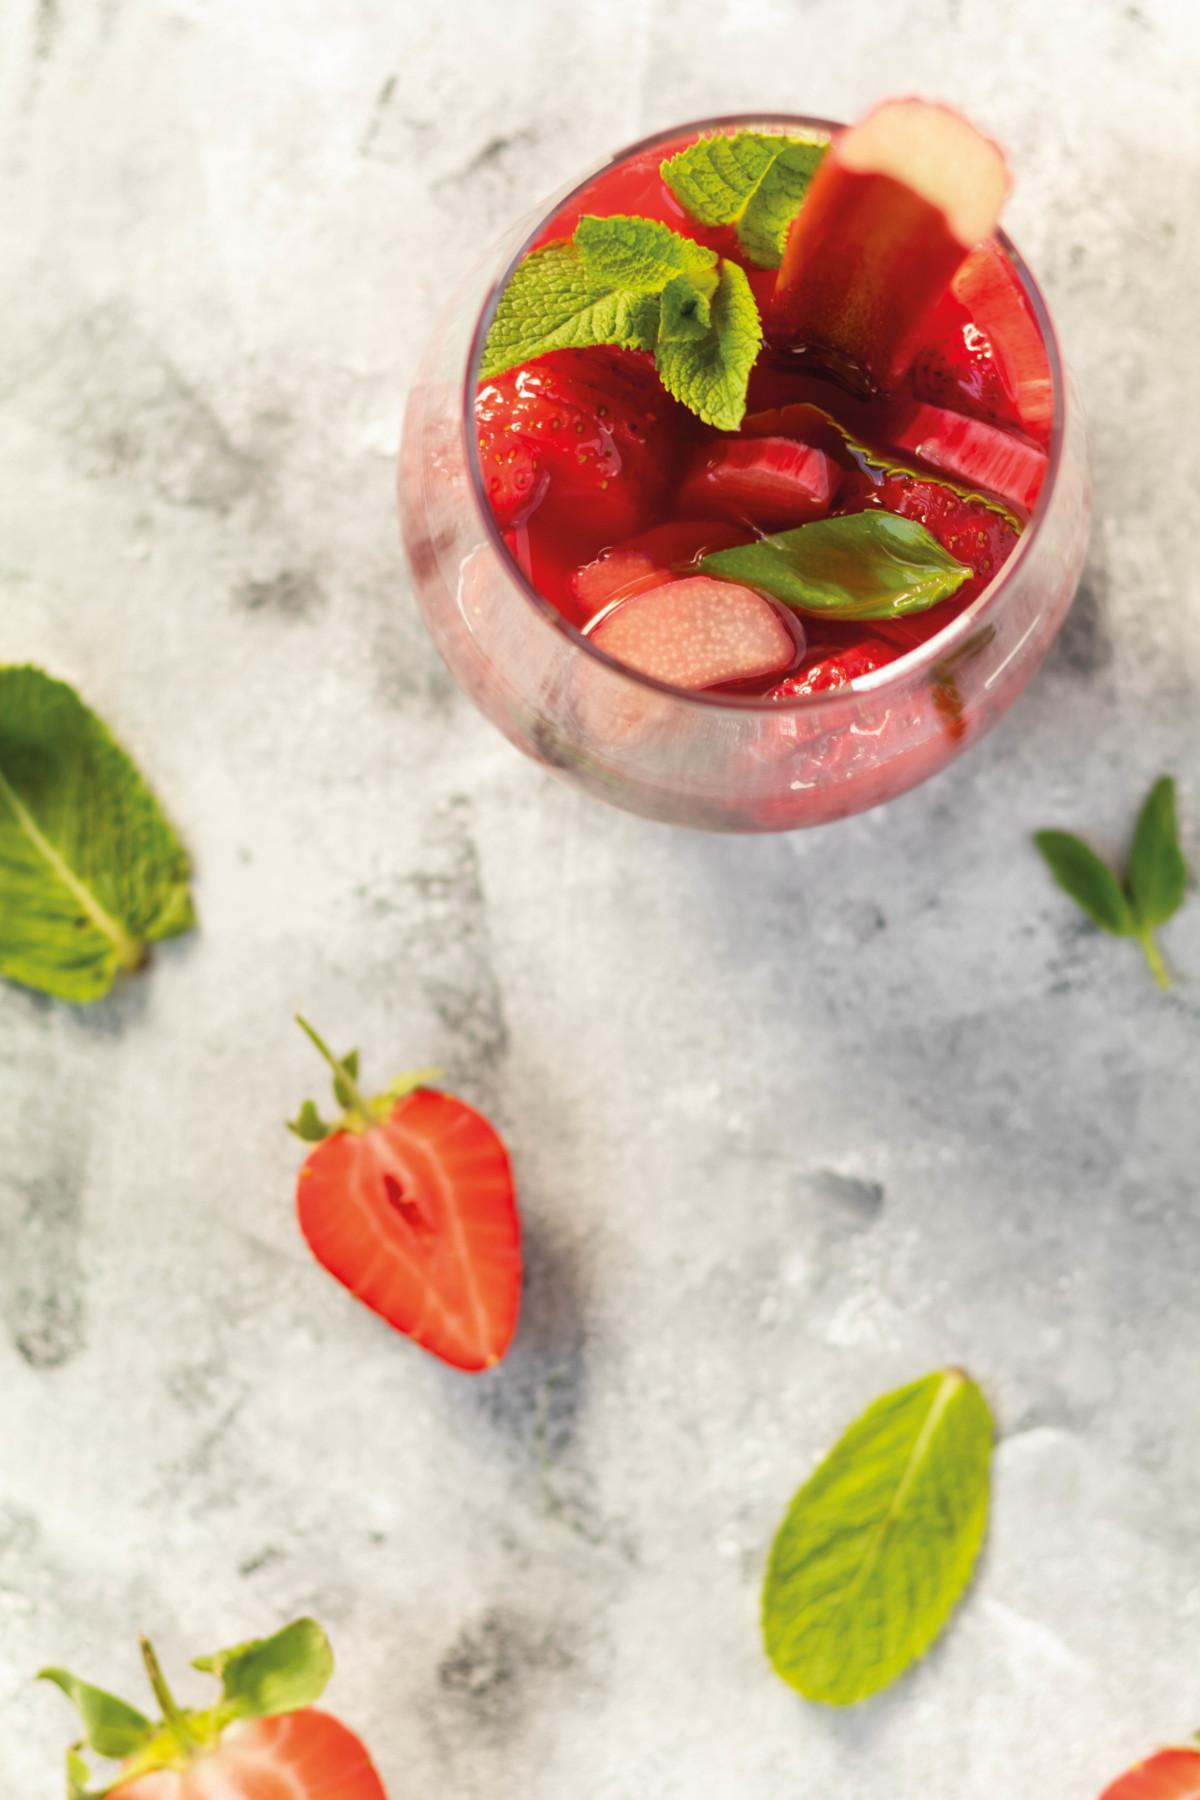 Erdbeer-Rhabarber-Bowle mit Minze und Basilikum // Strawberry-Rhubarb-Punch with mint and basil by https://babyrockmyday.com/erdbeer-rhabarber-bowle/